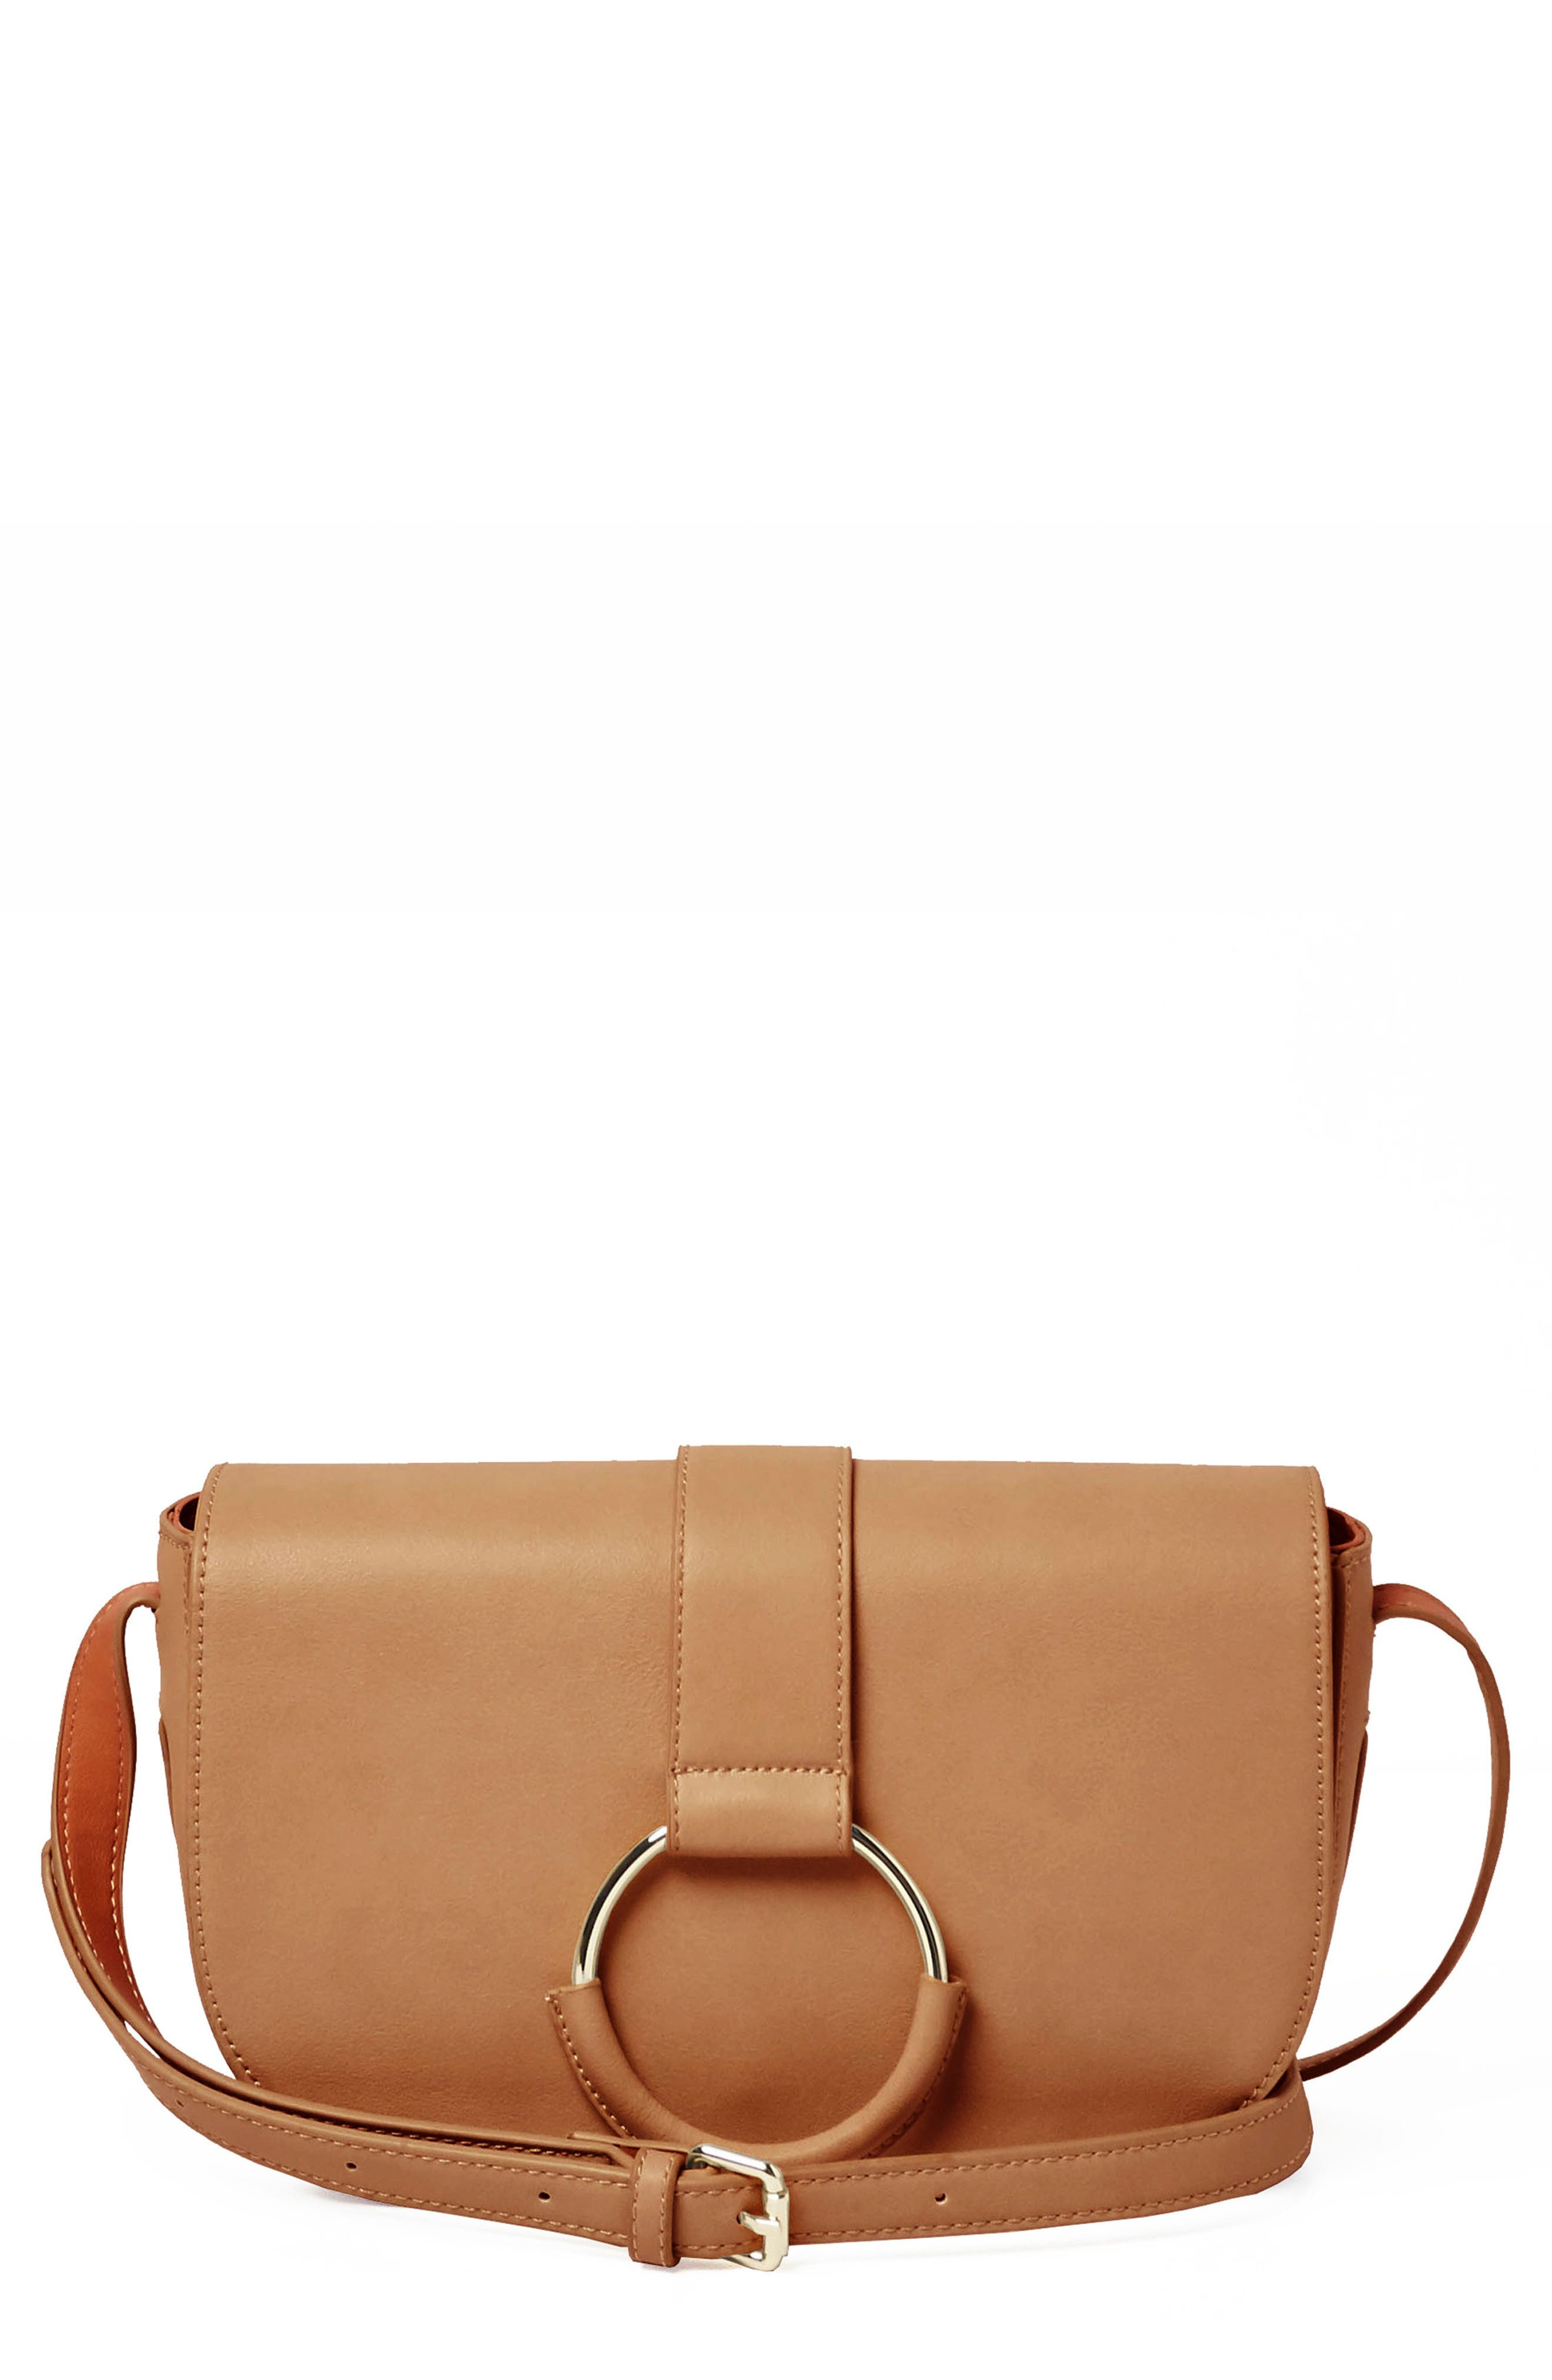 Lolita Vegan Leather Crossbody Bag,                             Main thumbnail 1, color,                             CAMEL